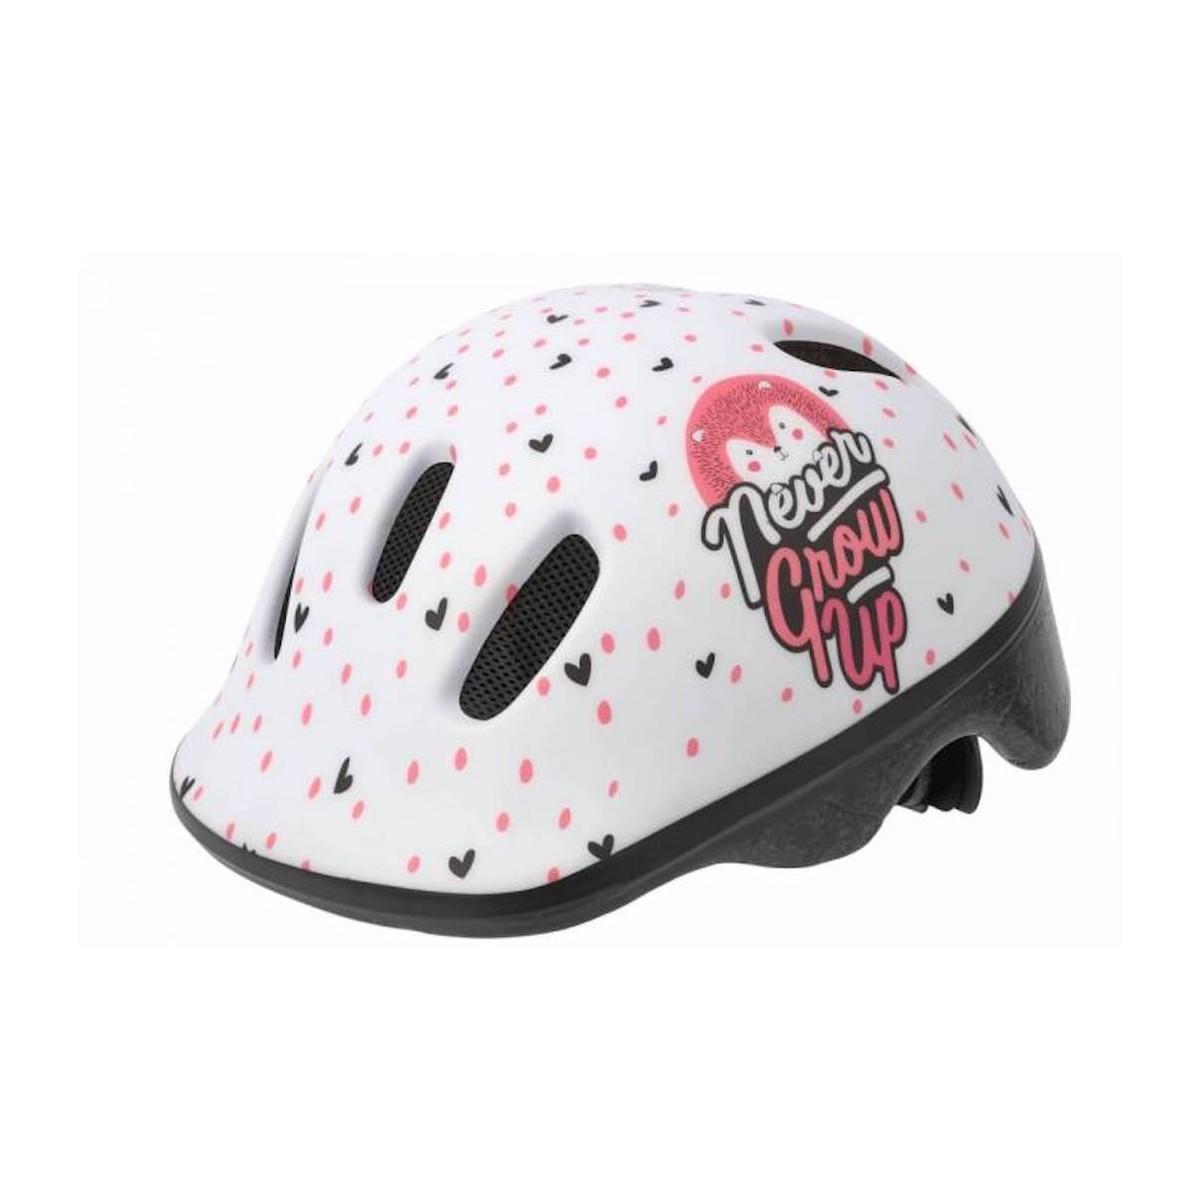 Kids bike helmets Polisport Hoggy